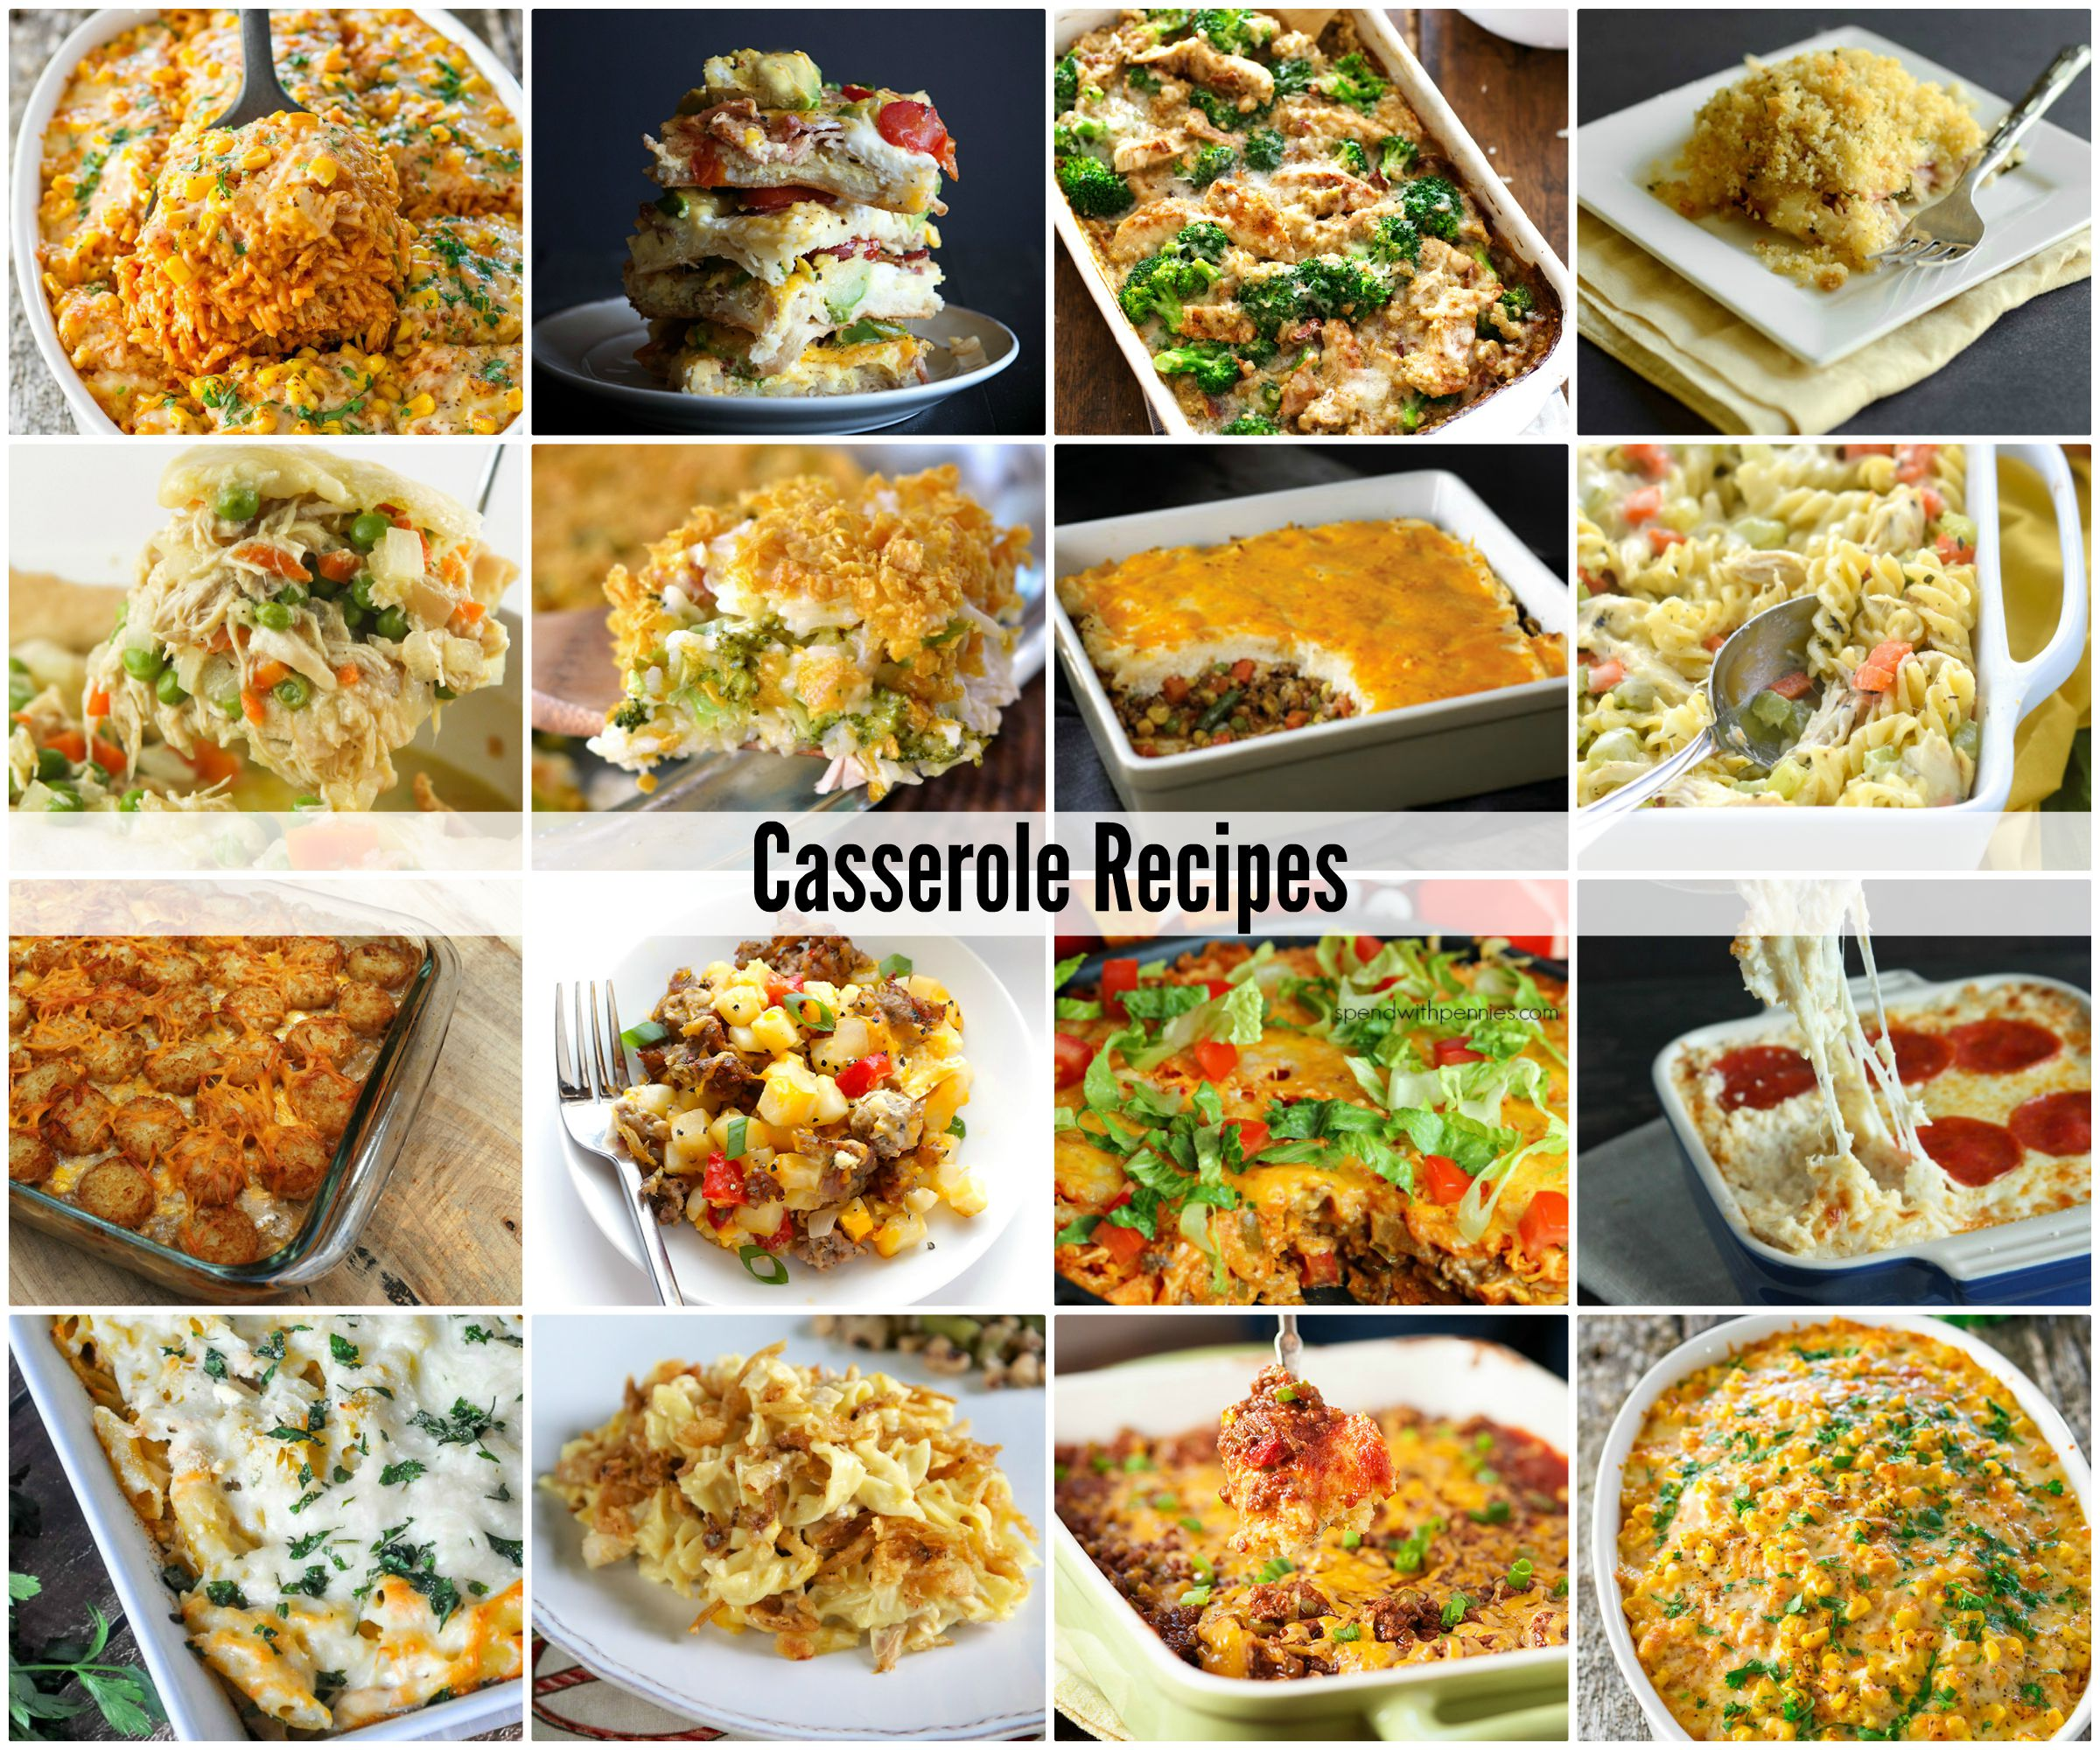 Casserole-Weeknight-Dinner-Recipes-1 (1)